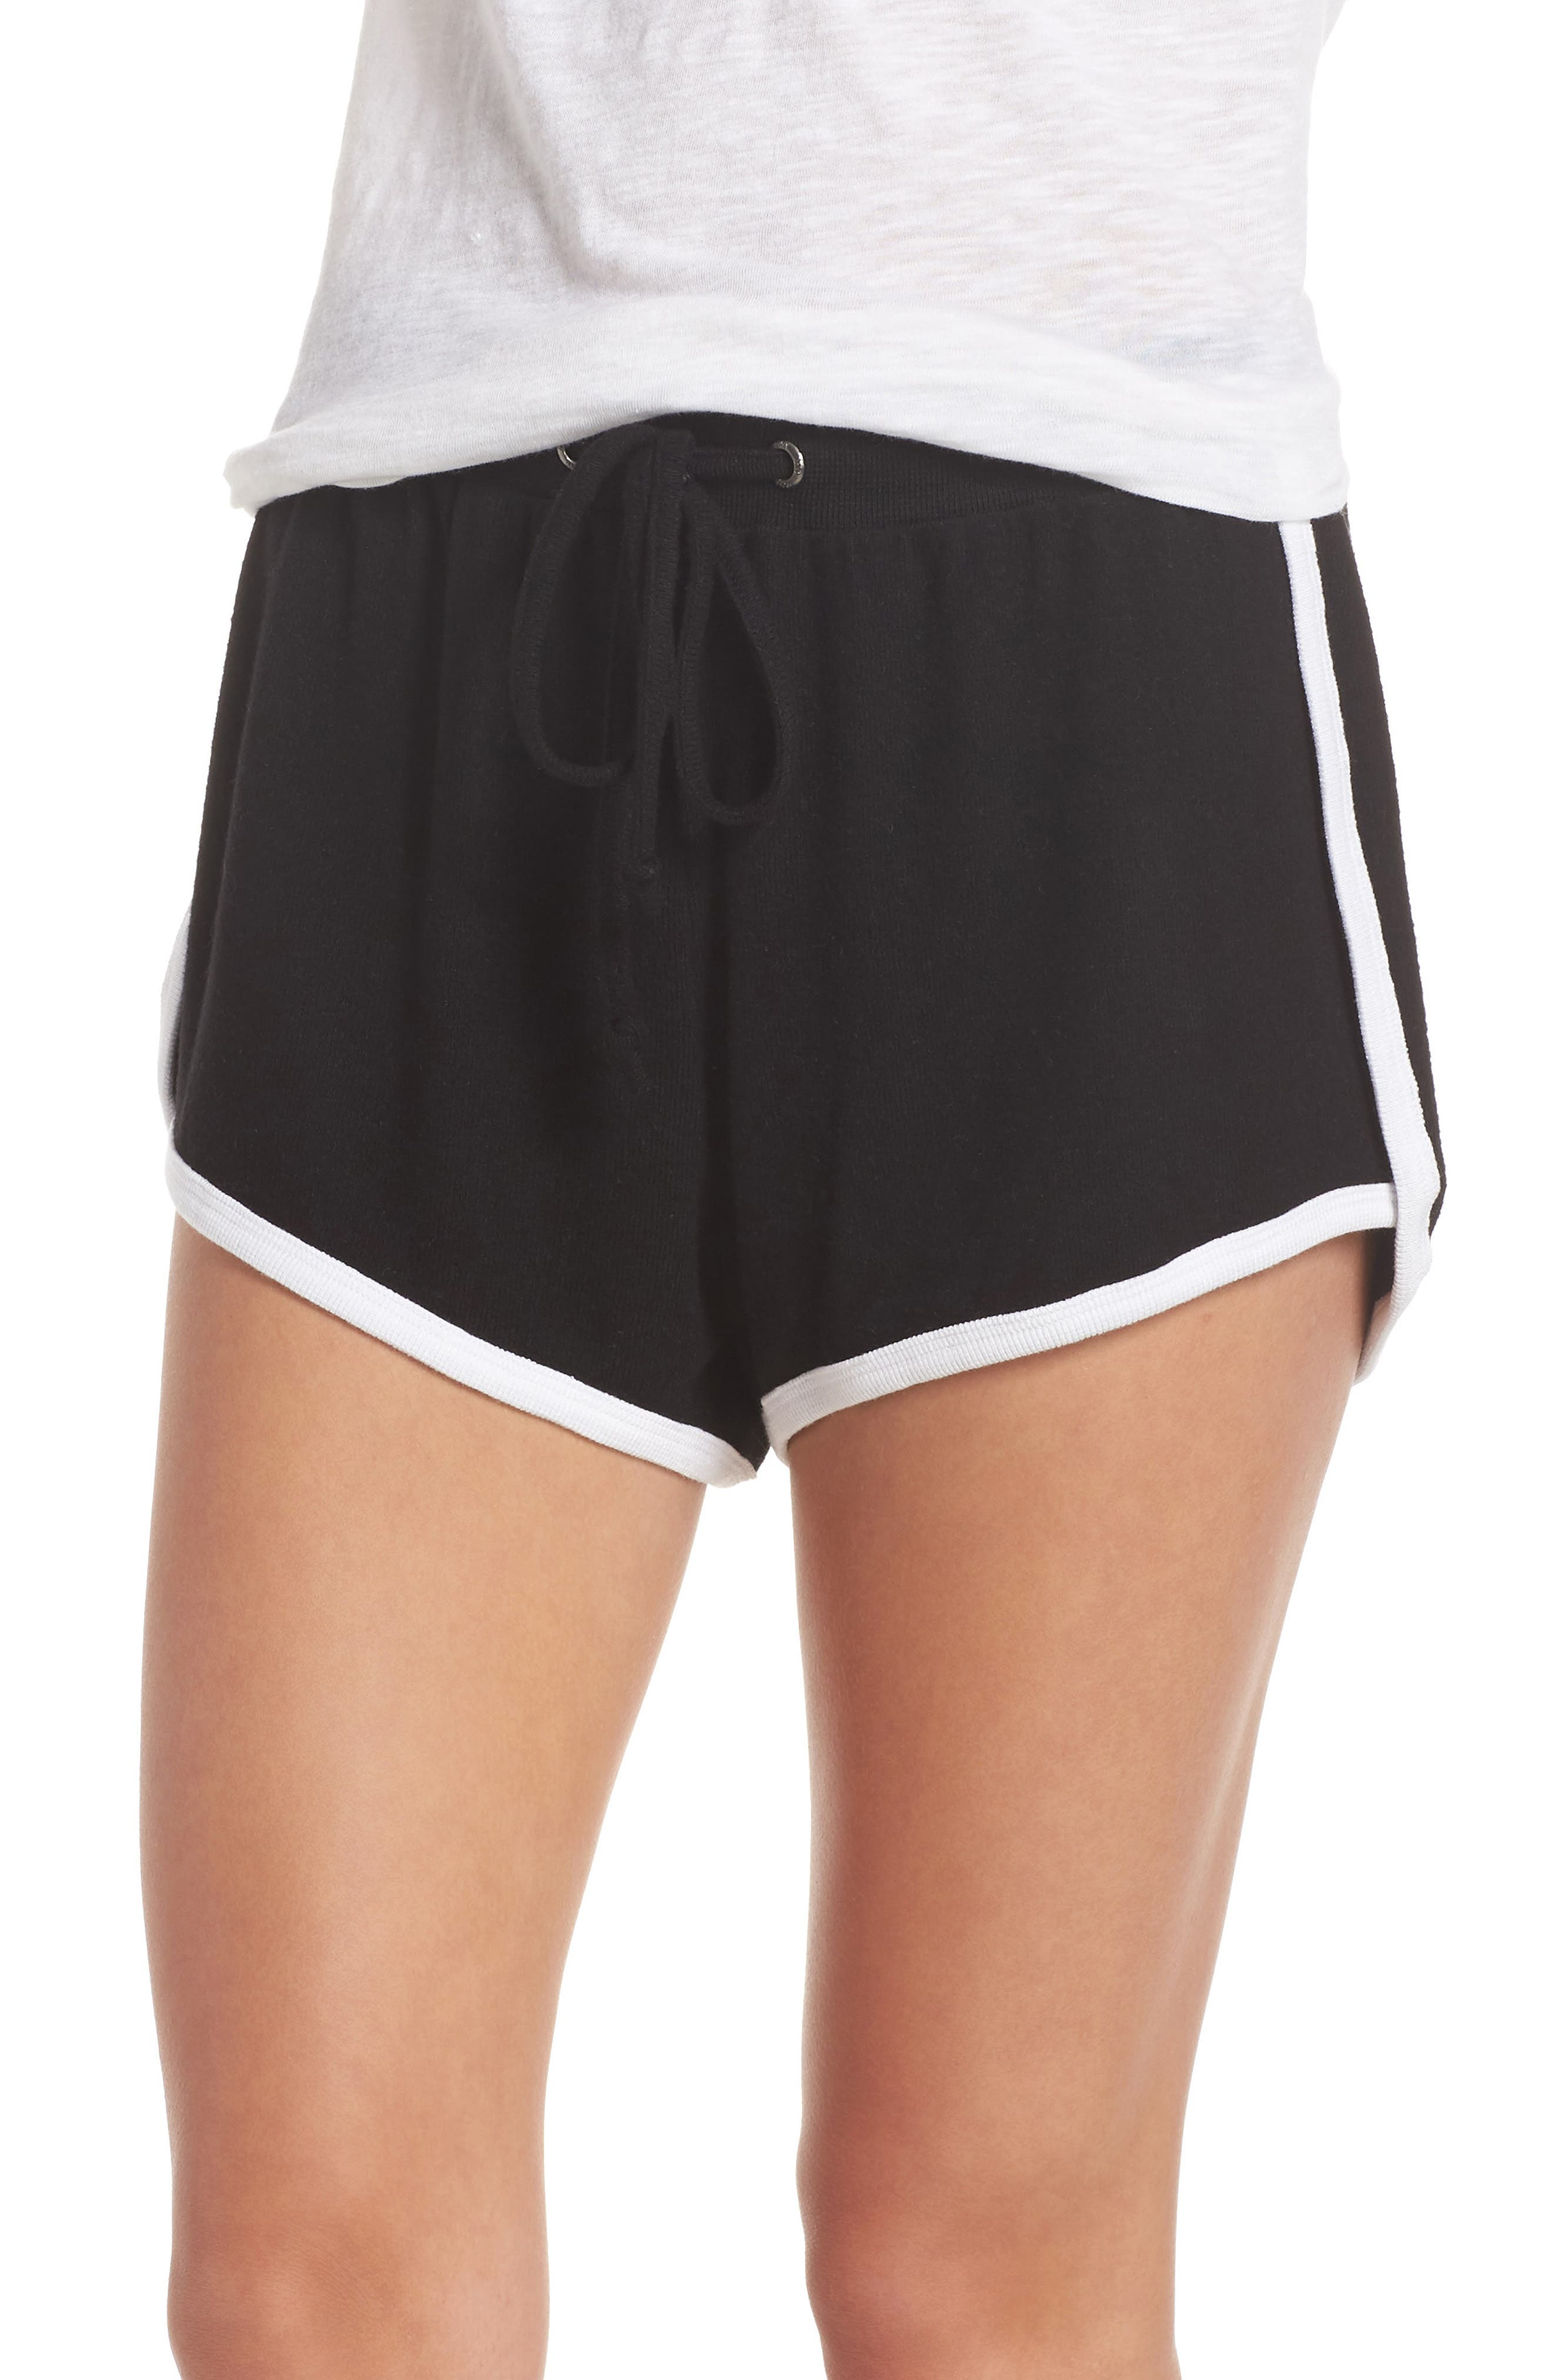 Too Cool Shorts,                         Main,                         color, BLACK